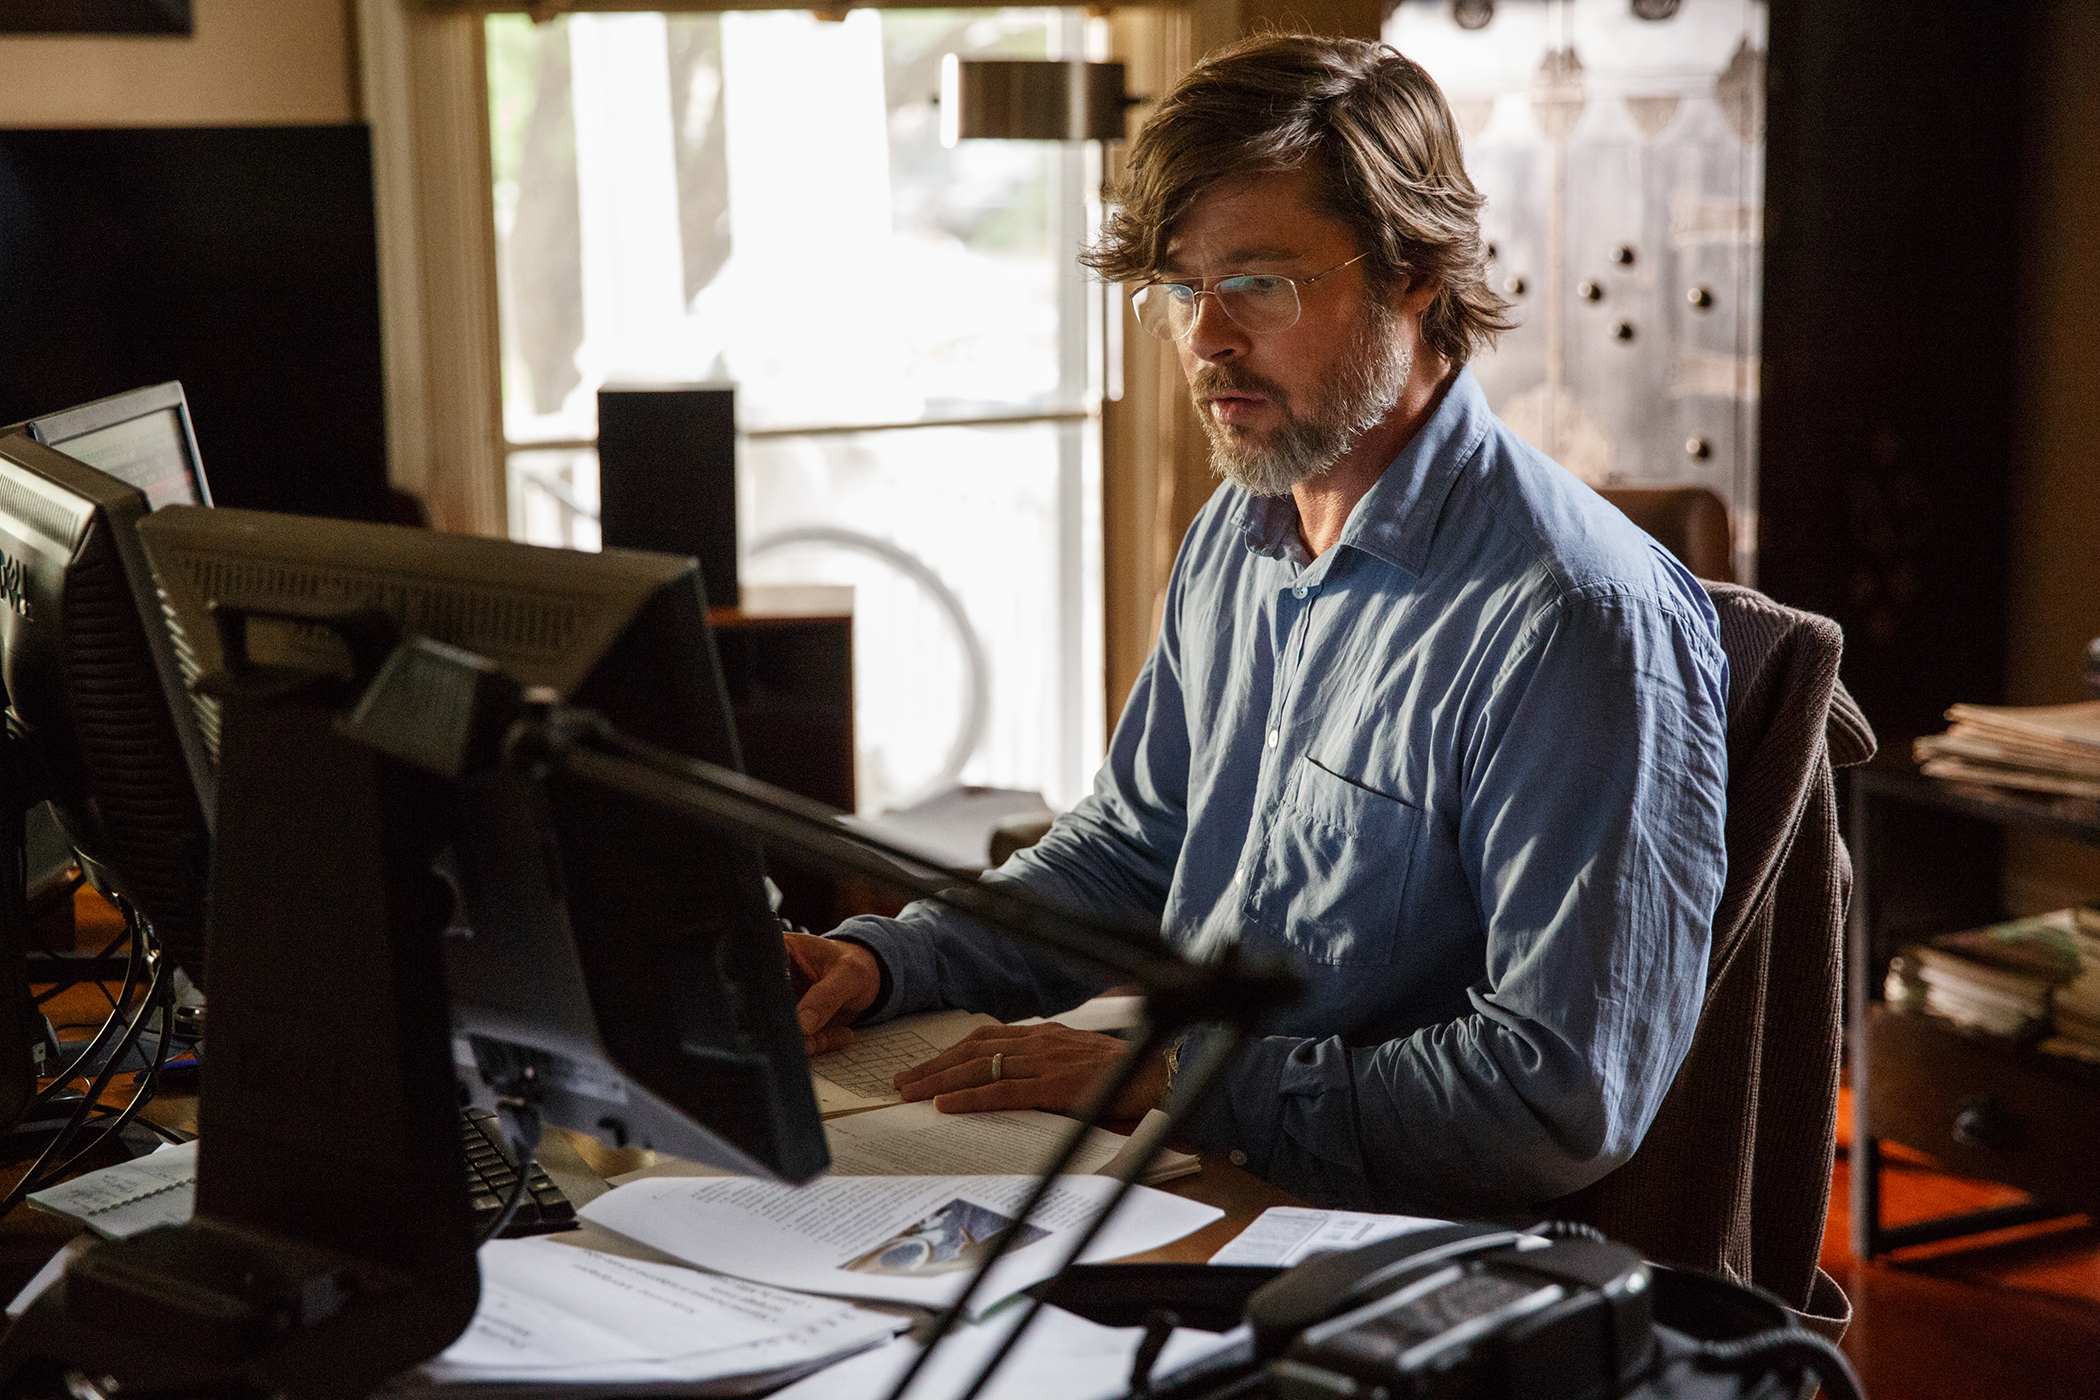 Brad Pitt plays Ben Rickert in The Big Short from  and Regency Enterprises